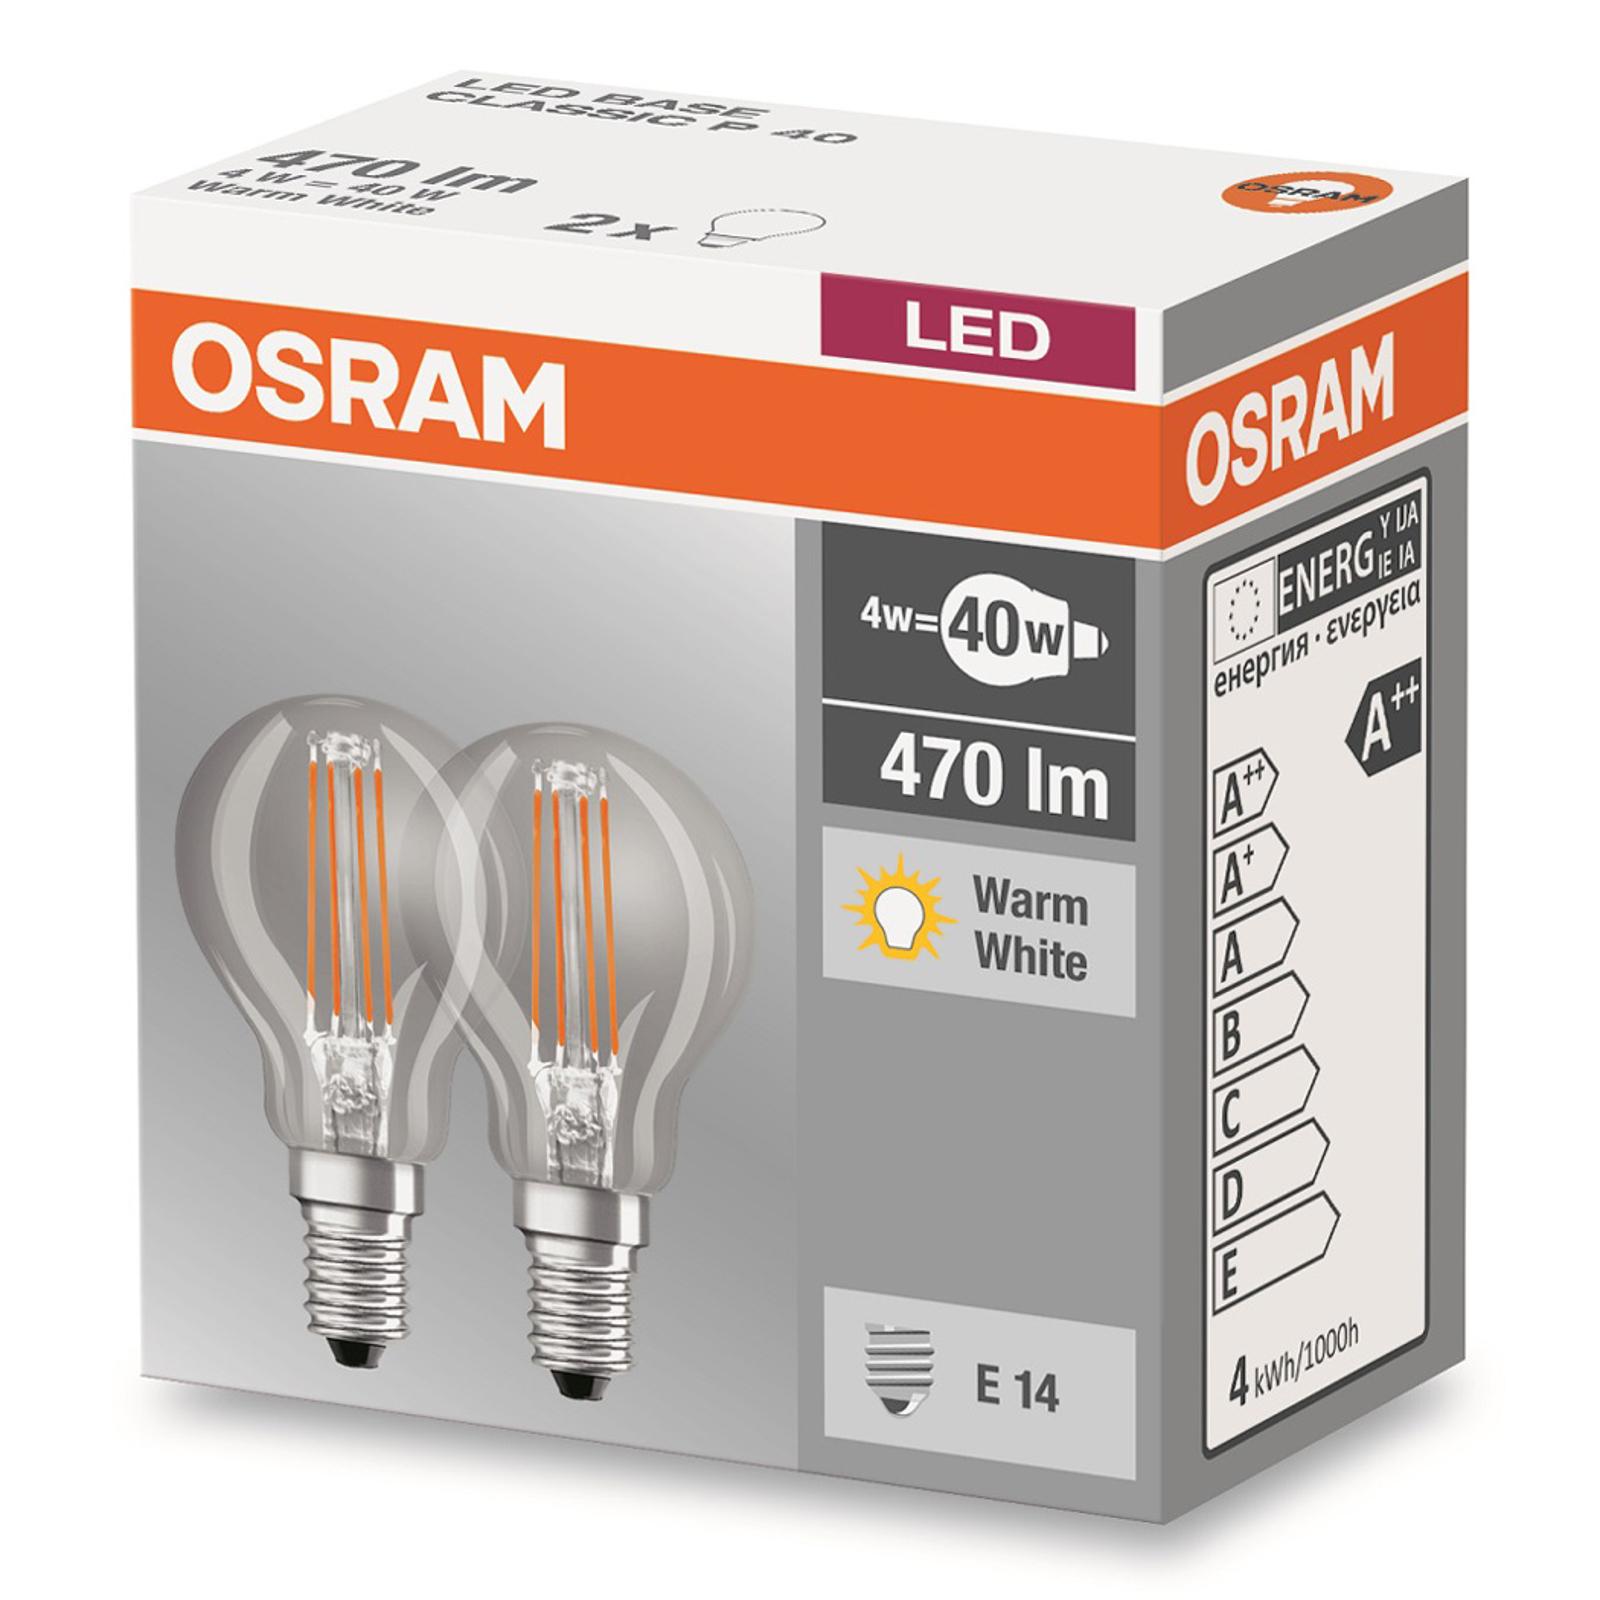 E14 4W 827 LED Tropfenlampe  2er Set